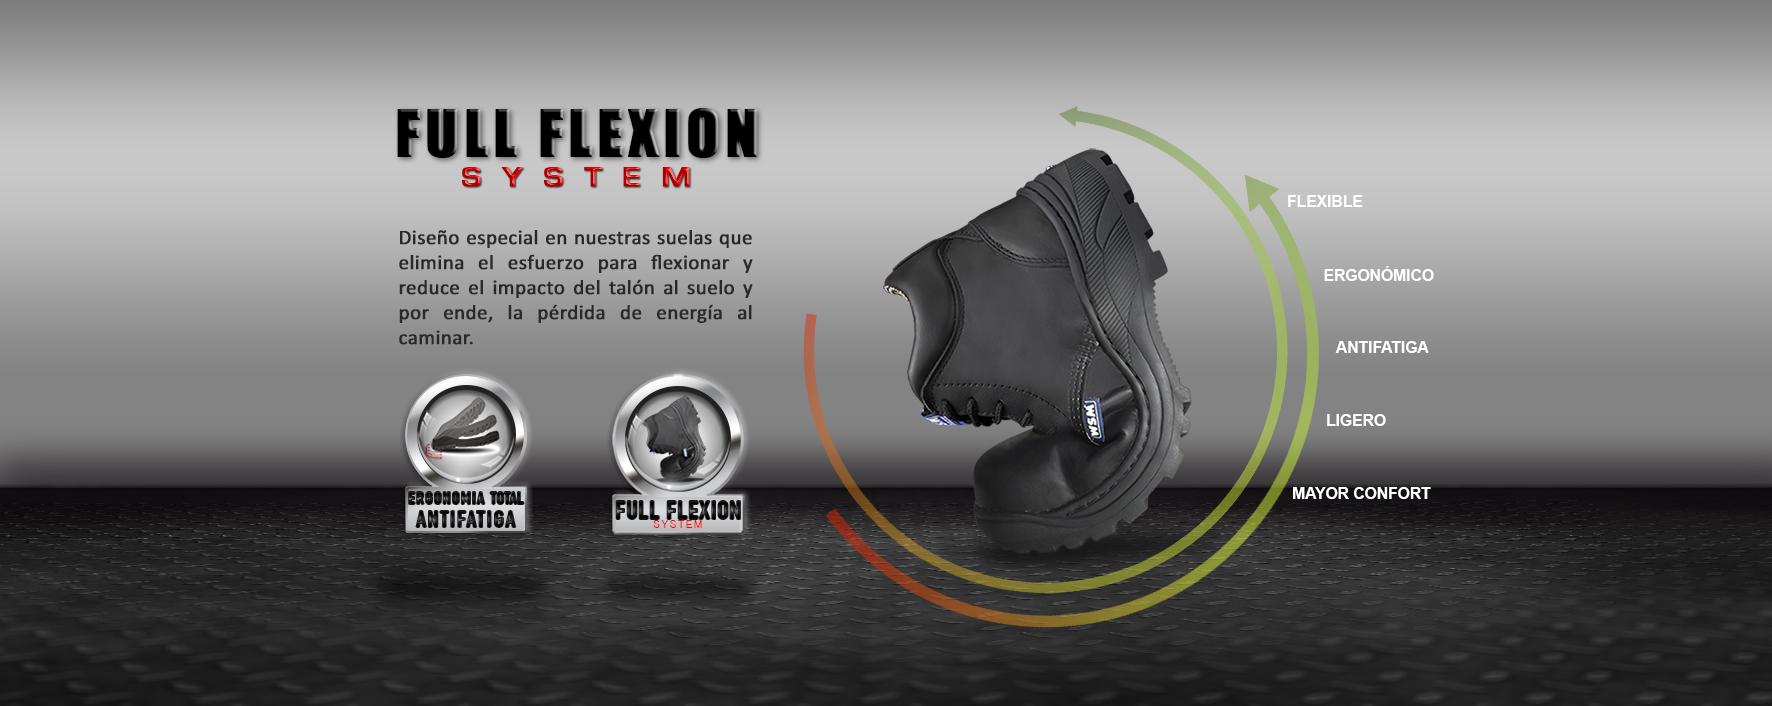 Full flexión